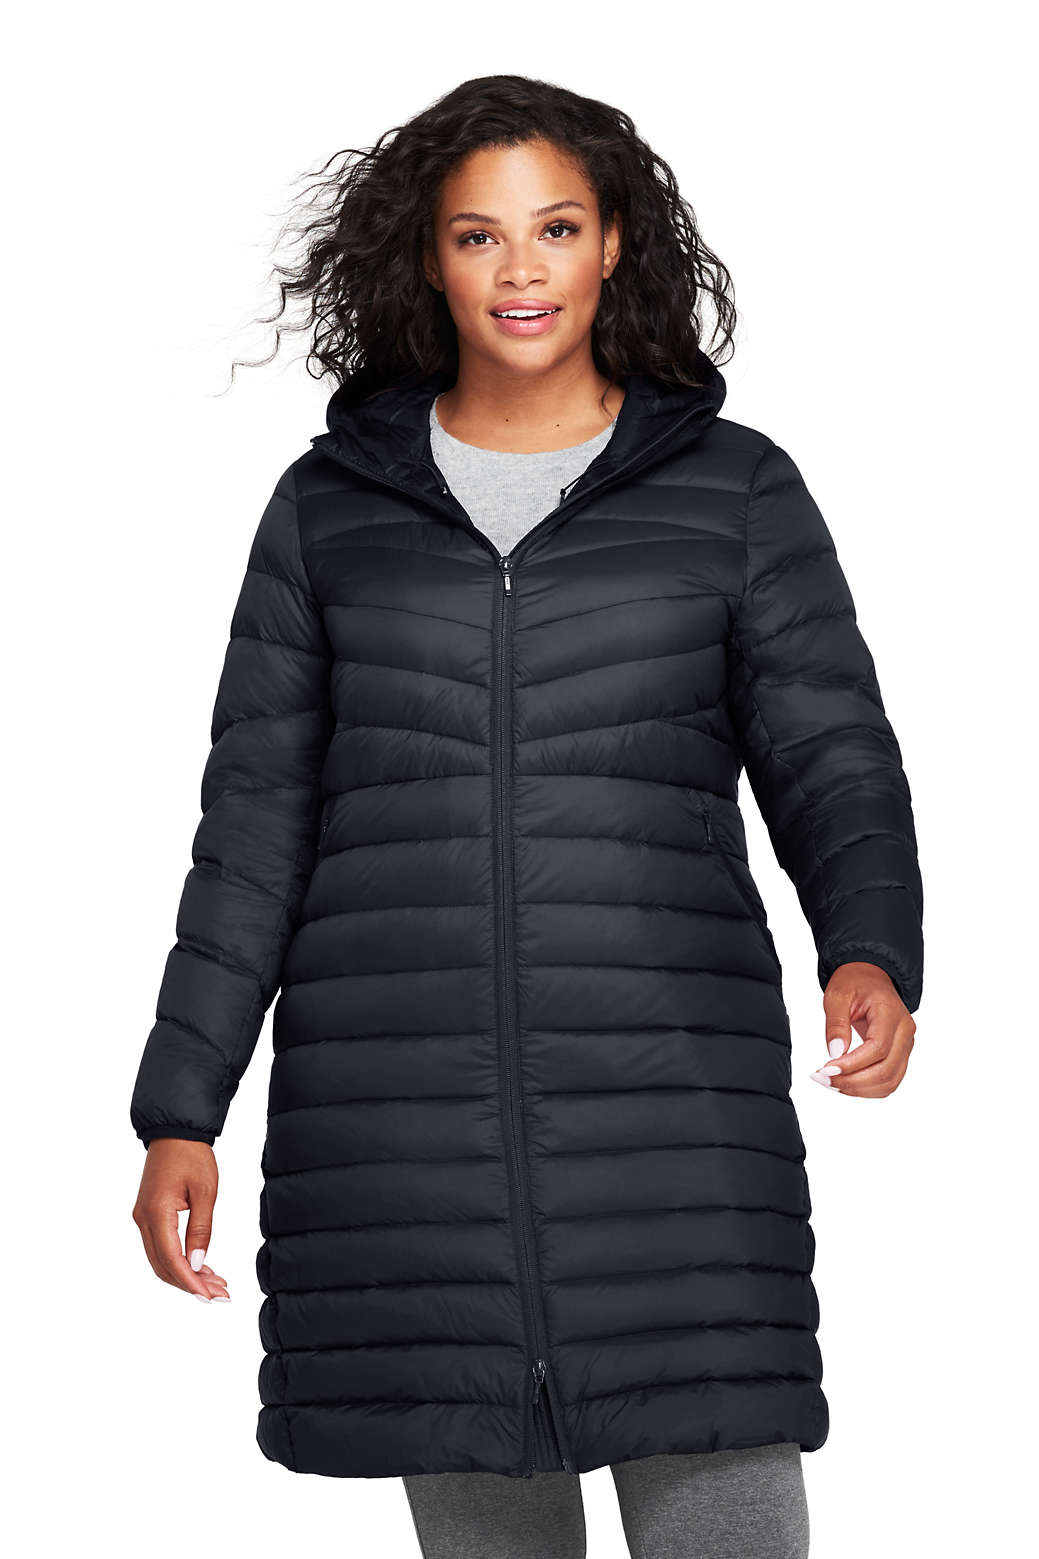 c8367337cf Women s Plus Size Ultralight Packable Long Down Coat from Lands  End